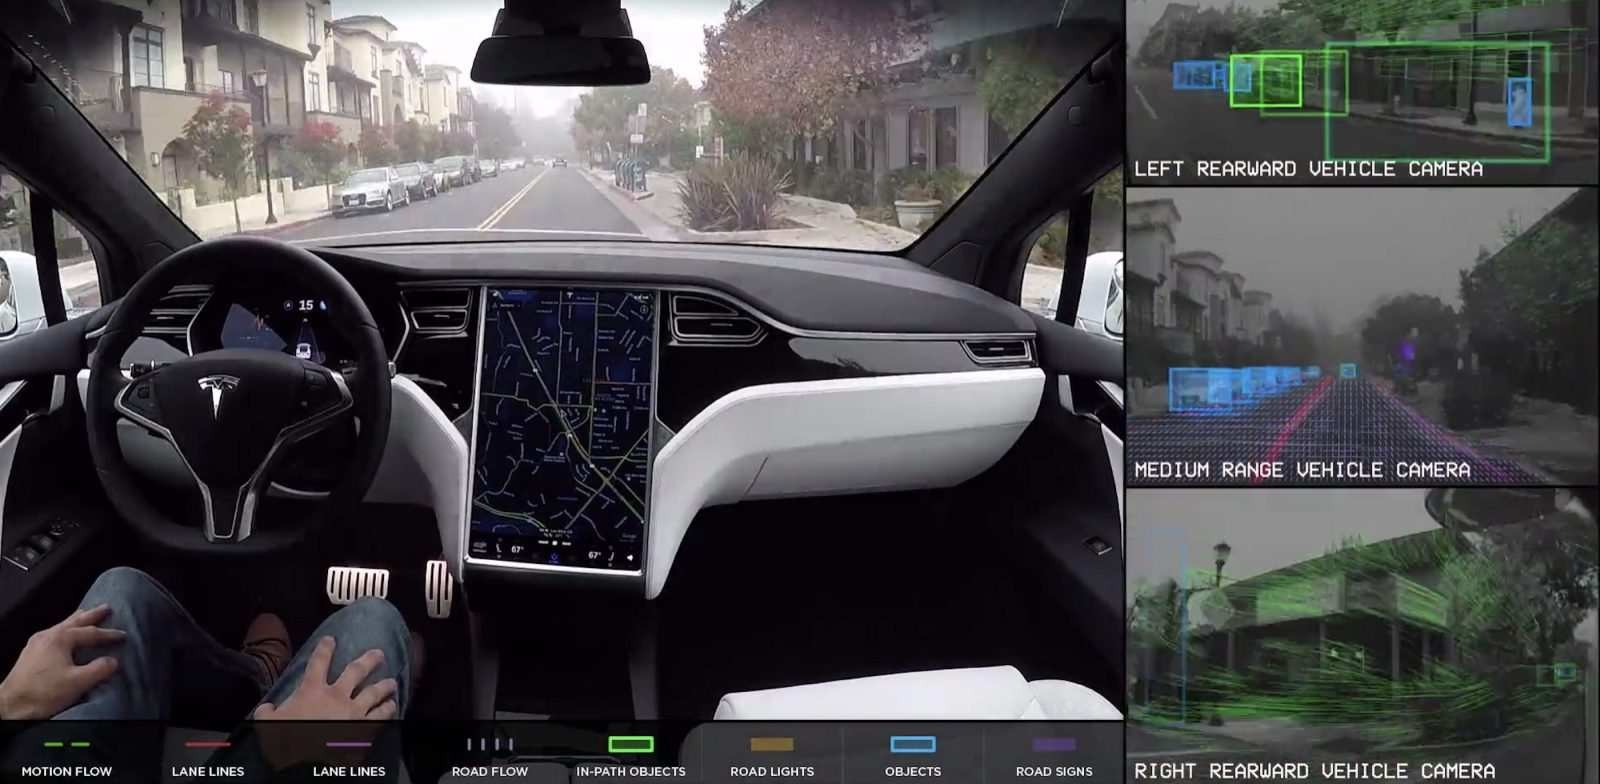 88 Gallery of Tesla Autopilot 2019 Overview for Tesla Autopilot 2019